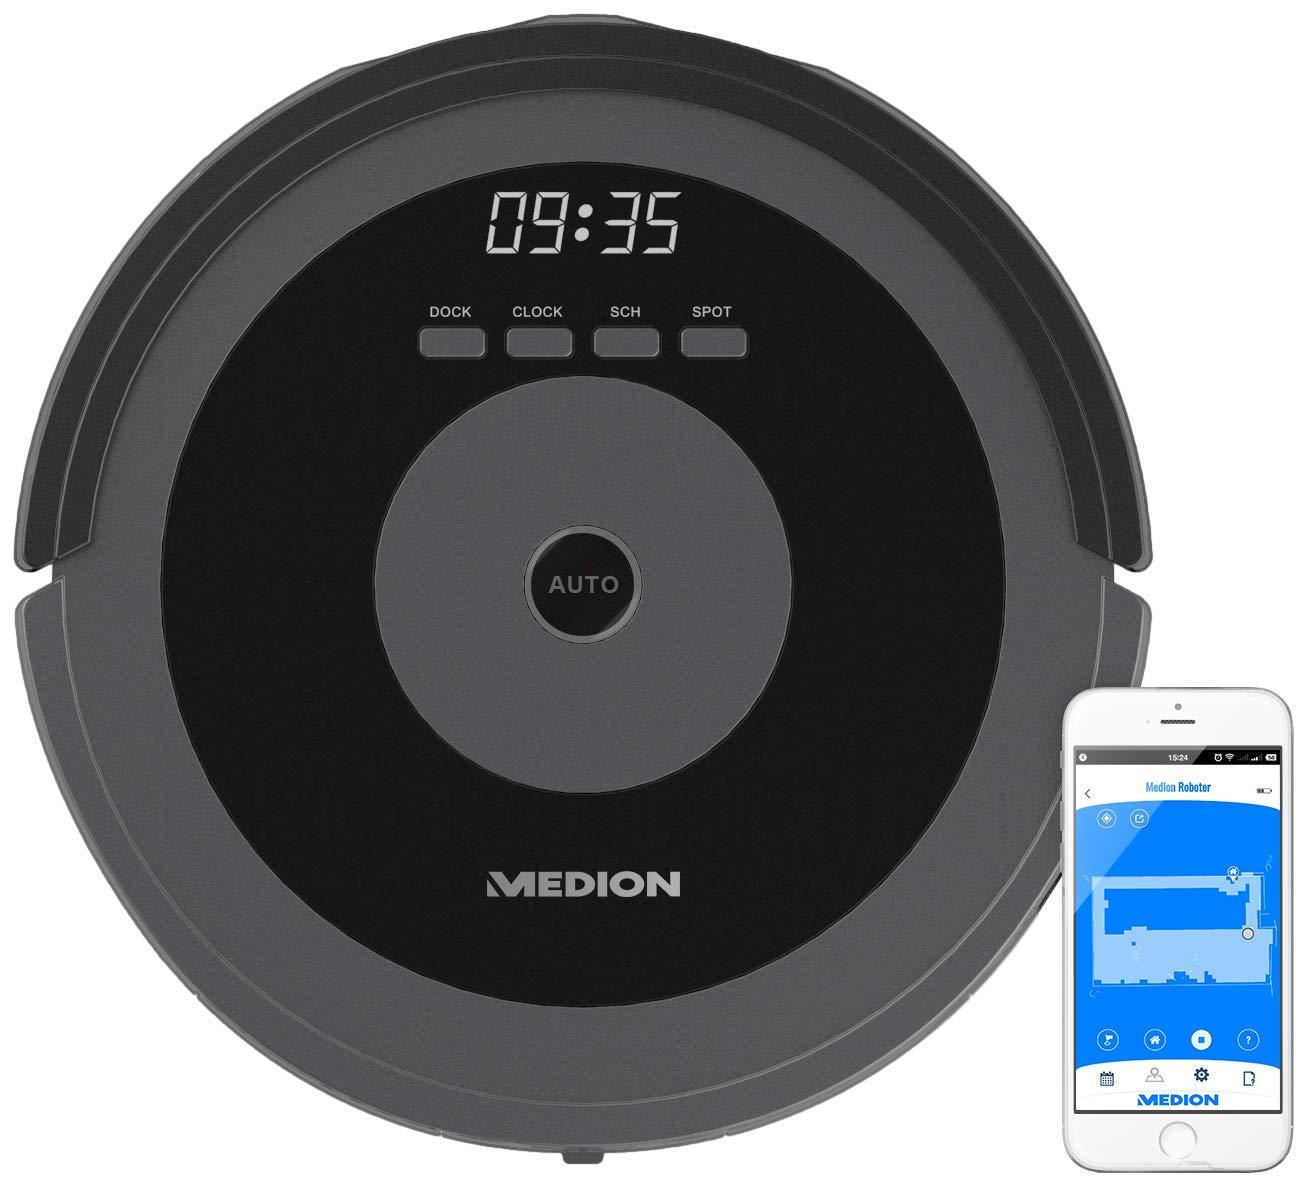 MEDION Robot Aspirador MD 17225 Negro: Amazon.es: Hogar